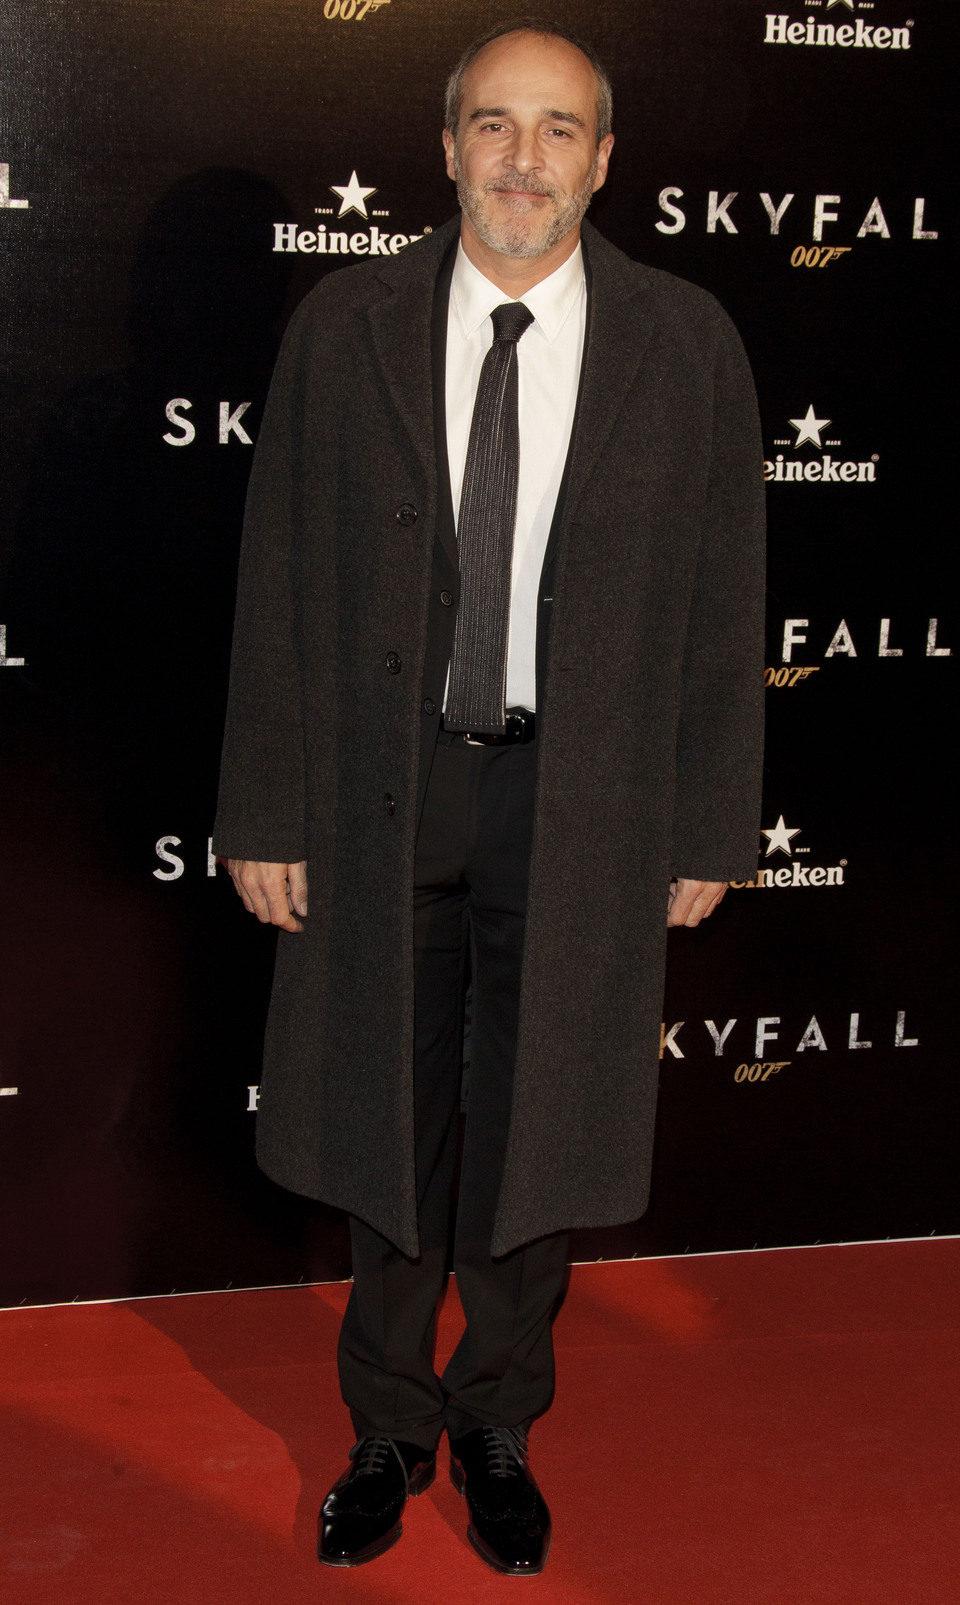 Fernando Guillén Cuervo en la premiere de 'Skyfall' en Madrid